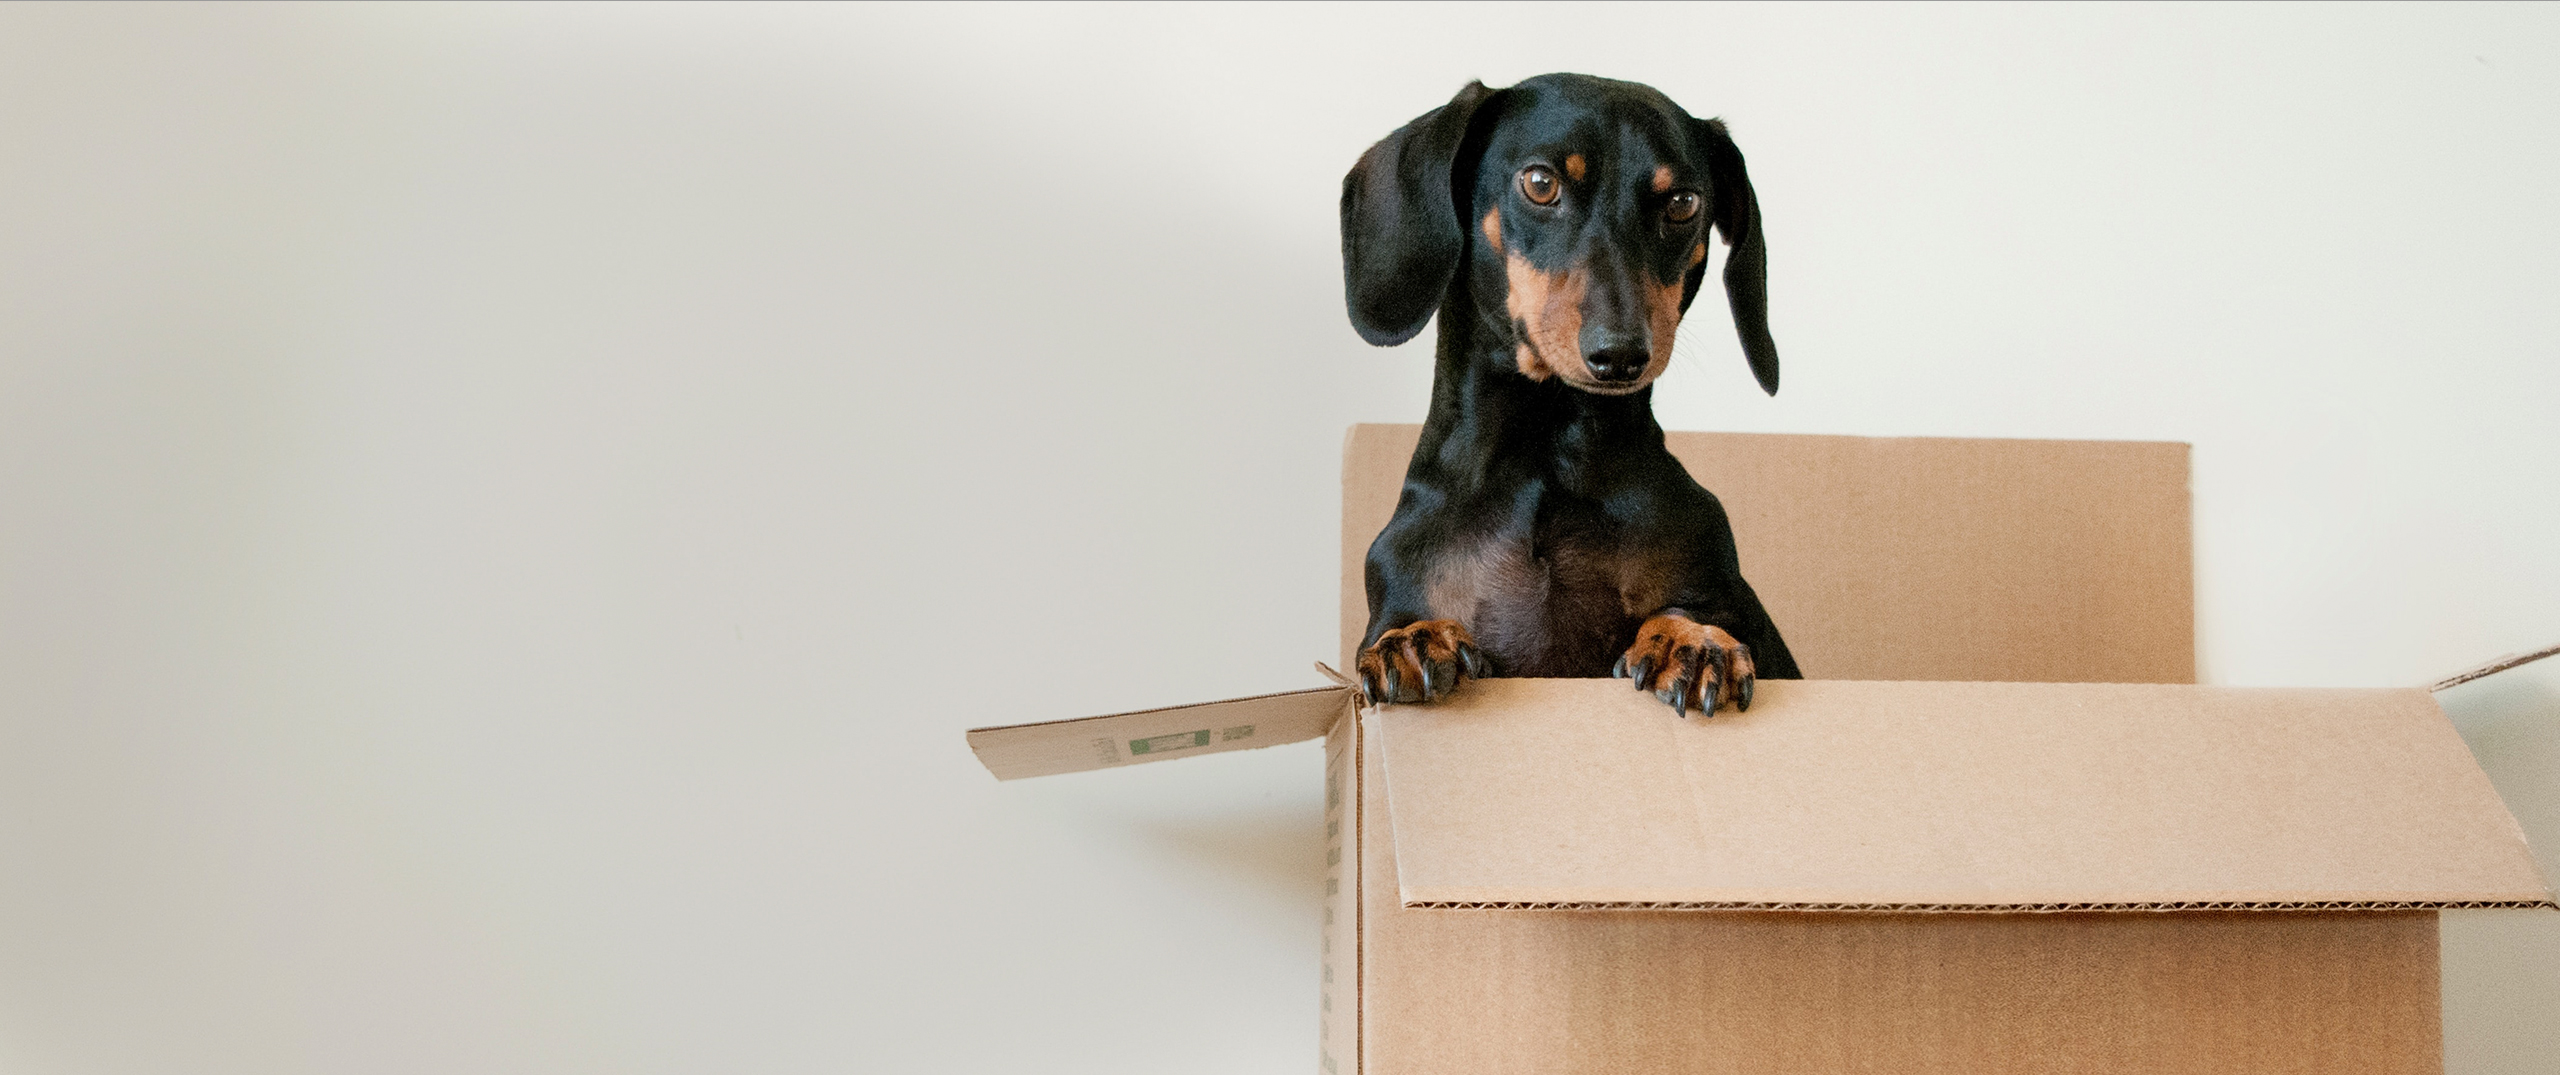 Black dachsund peeking out of a cardboard box